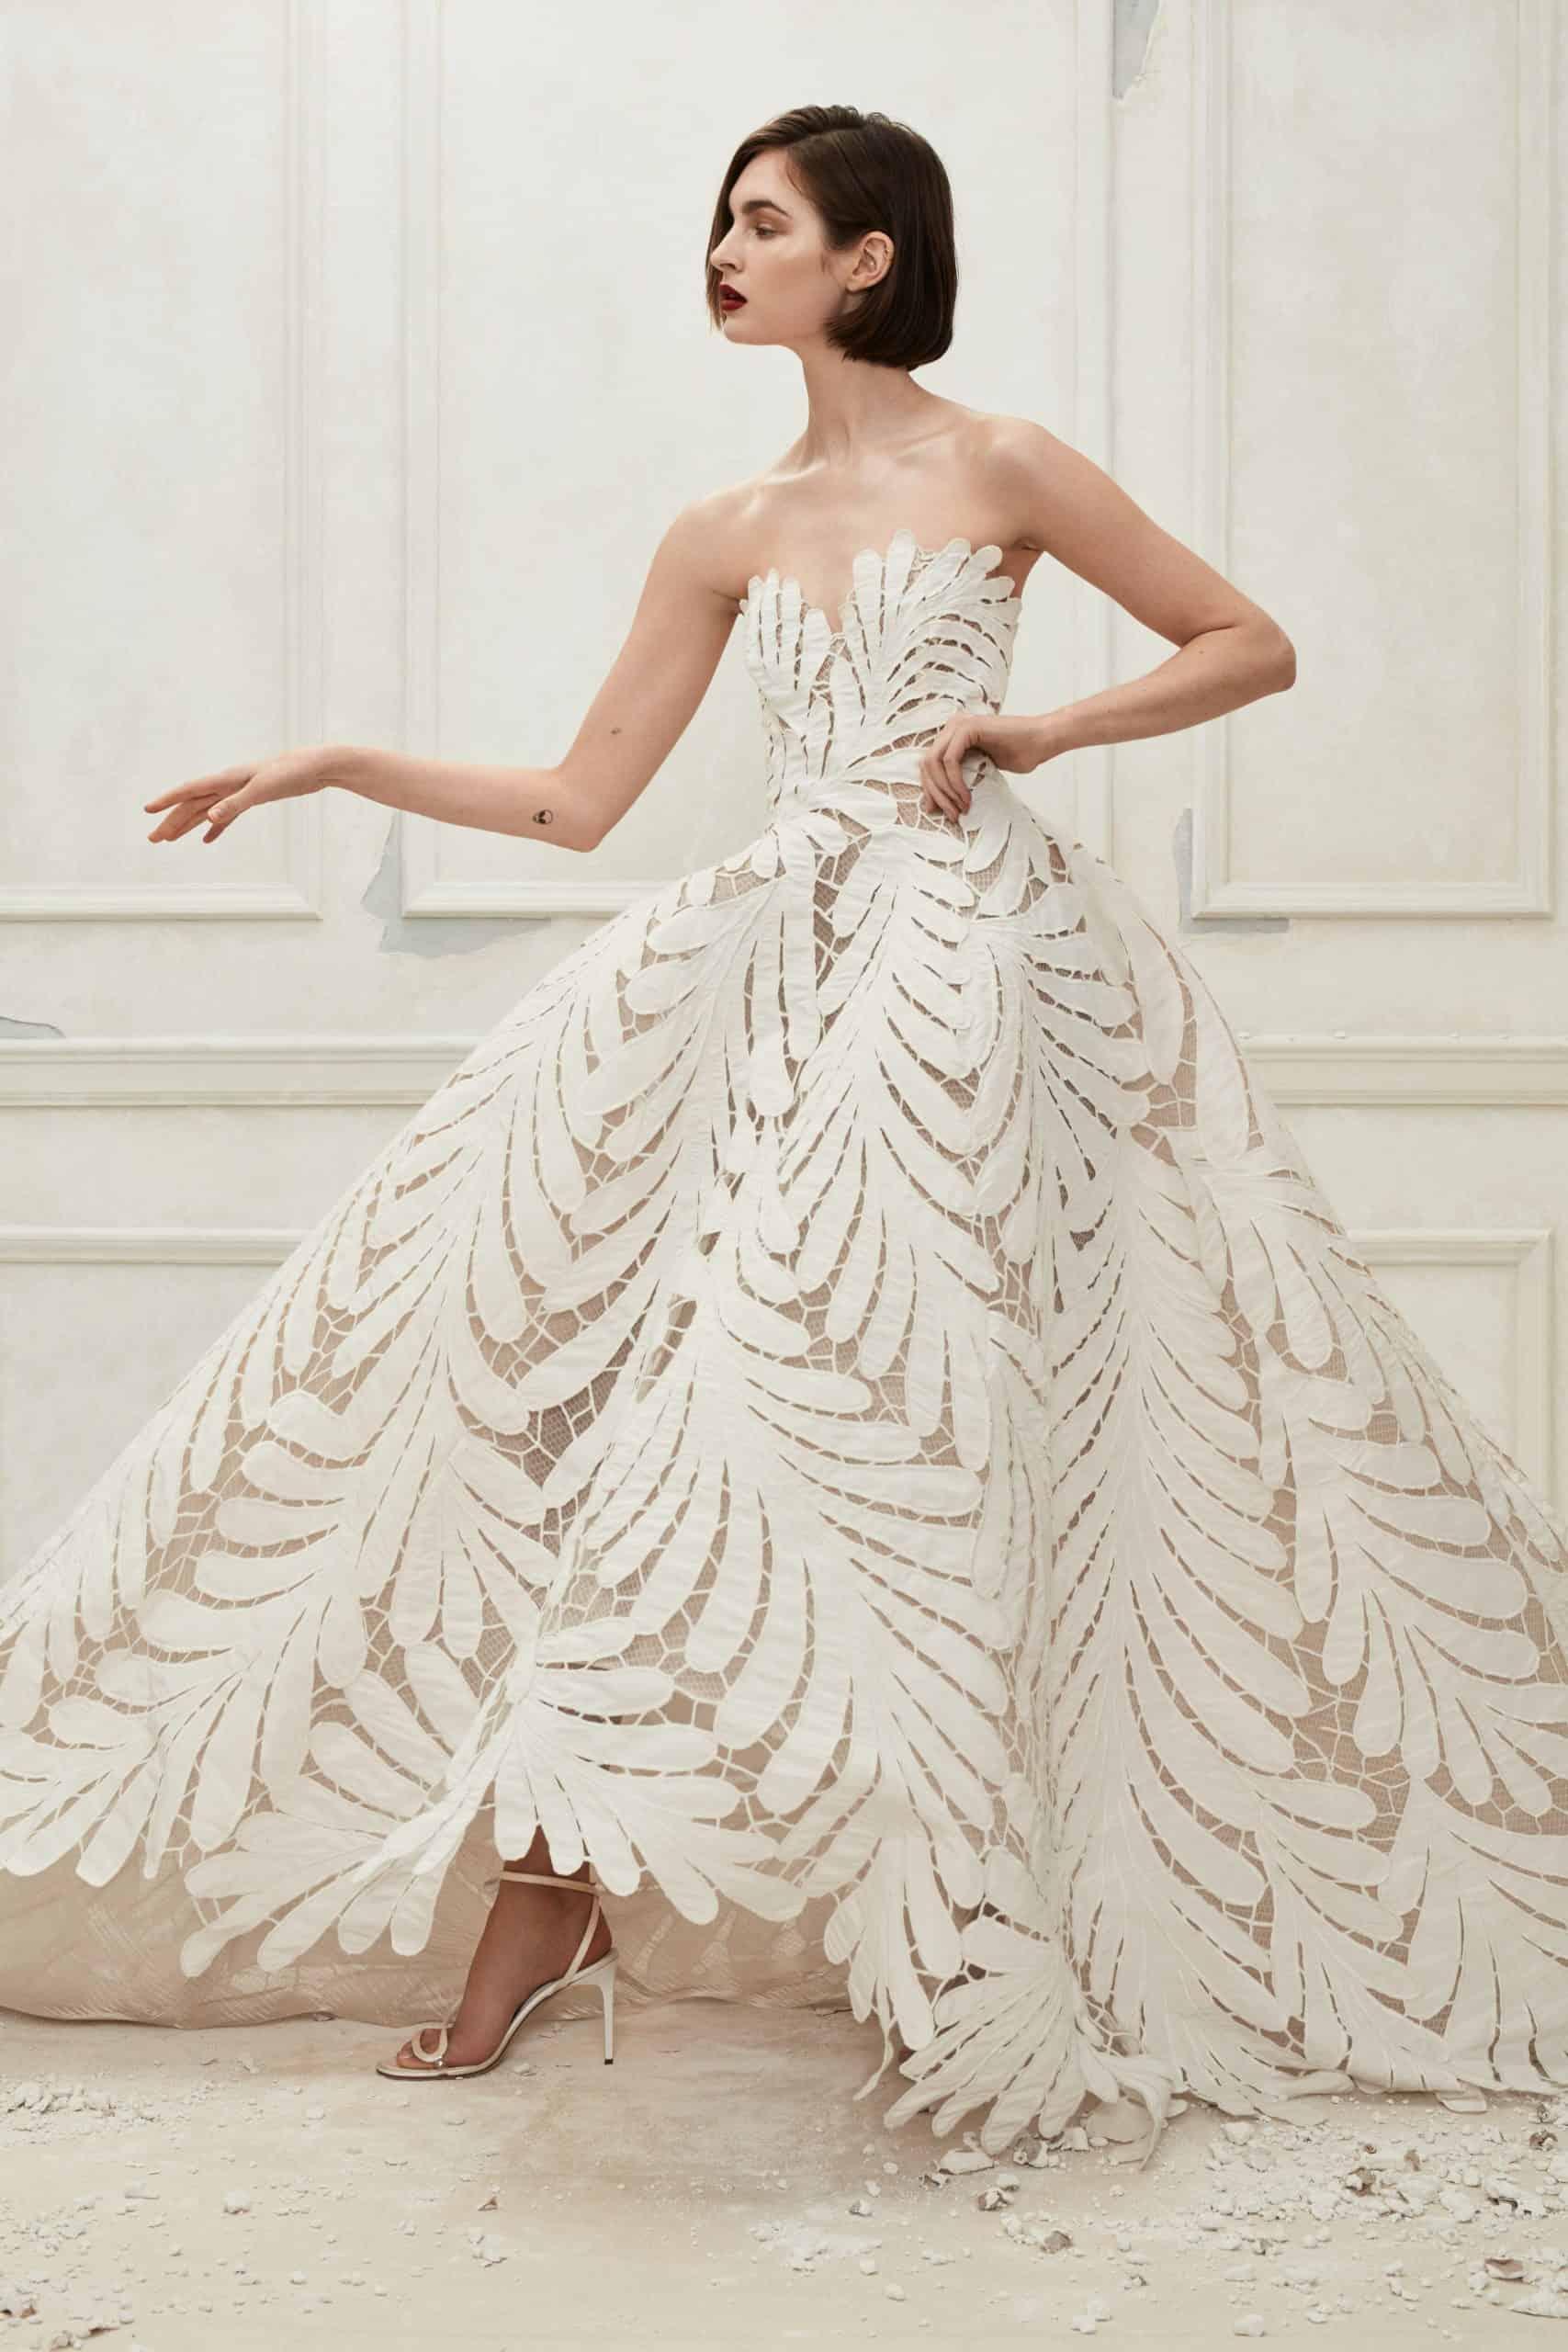 strapless laced wedding dress fall 2019 by Oscar de la Renta